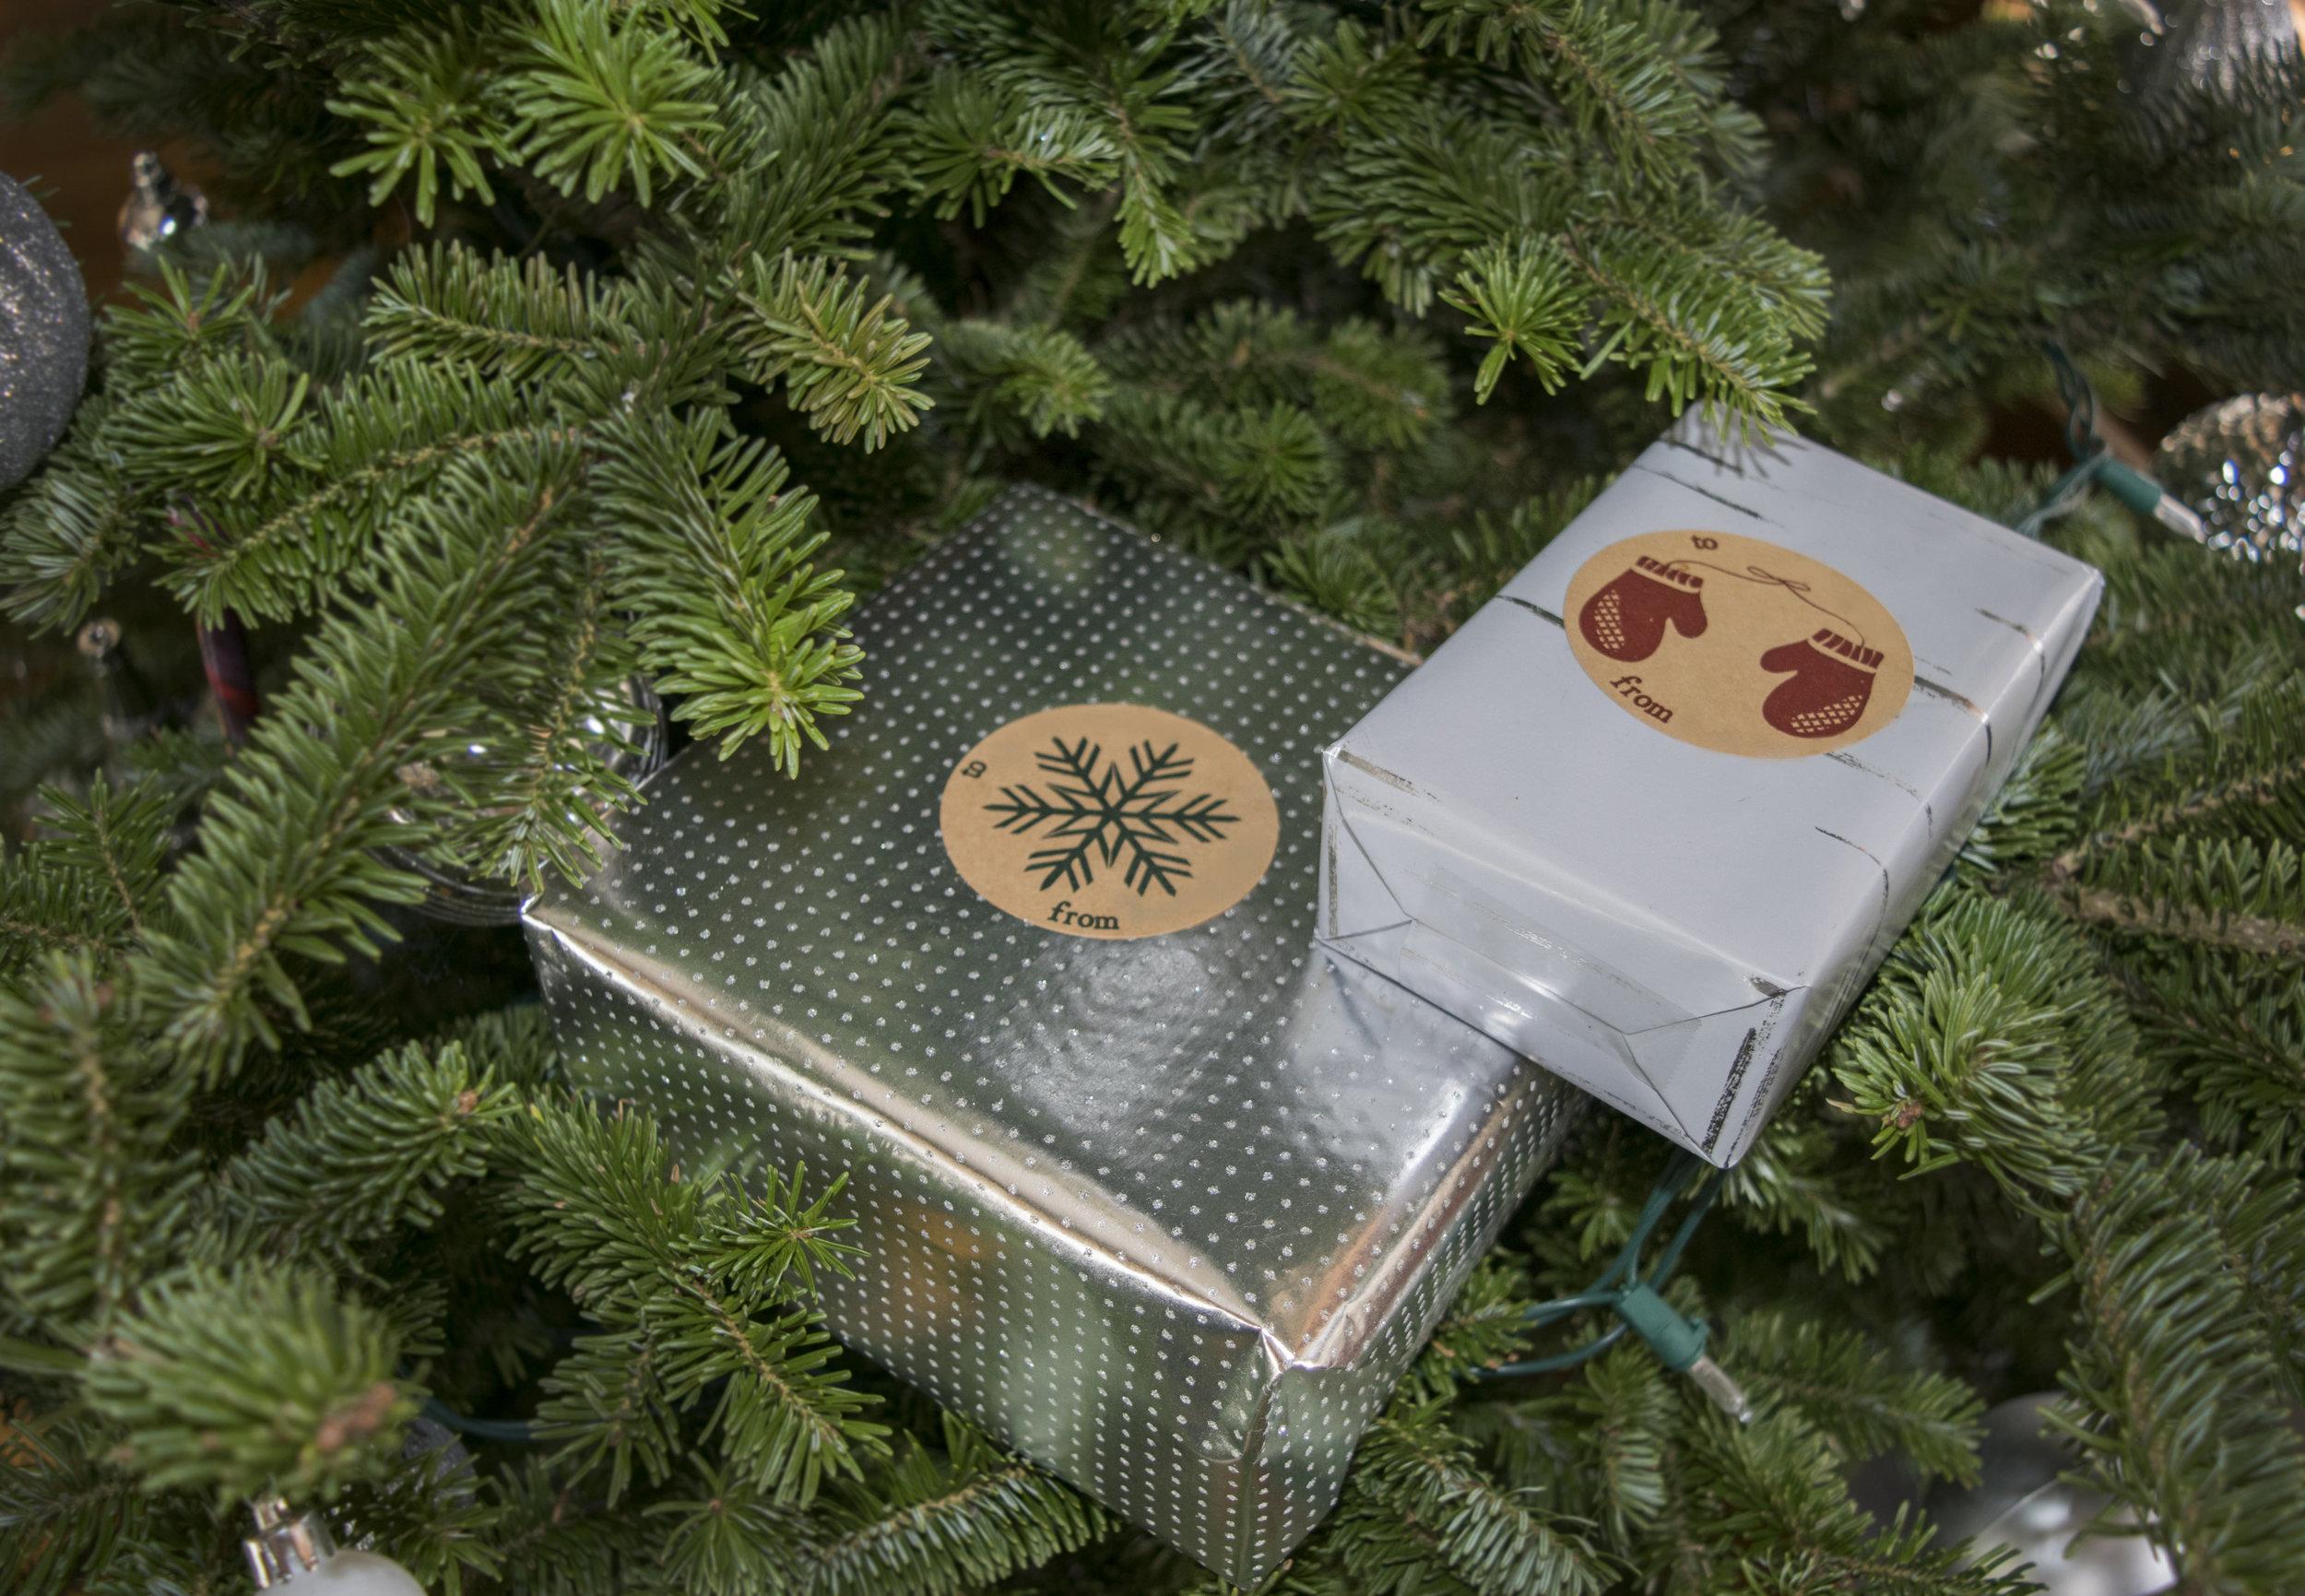 mn label christmas labels photoshoot 2018.jpg